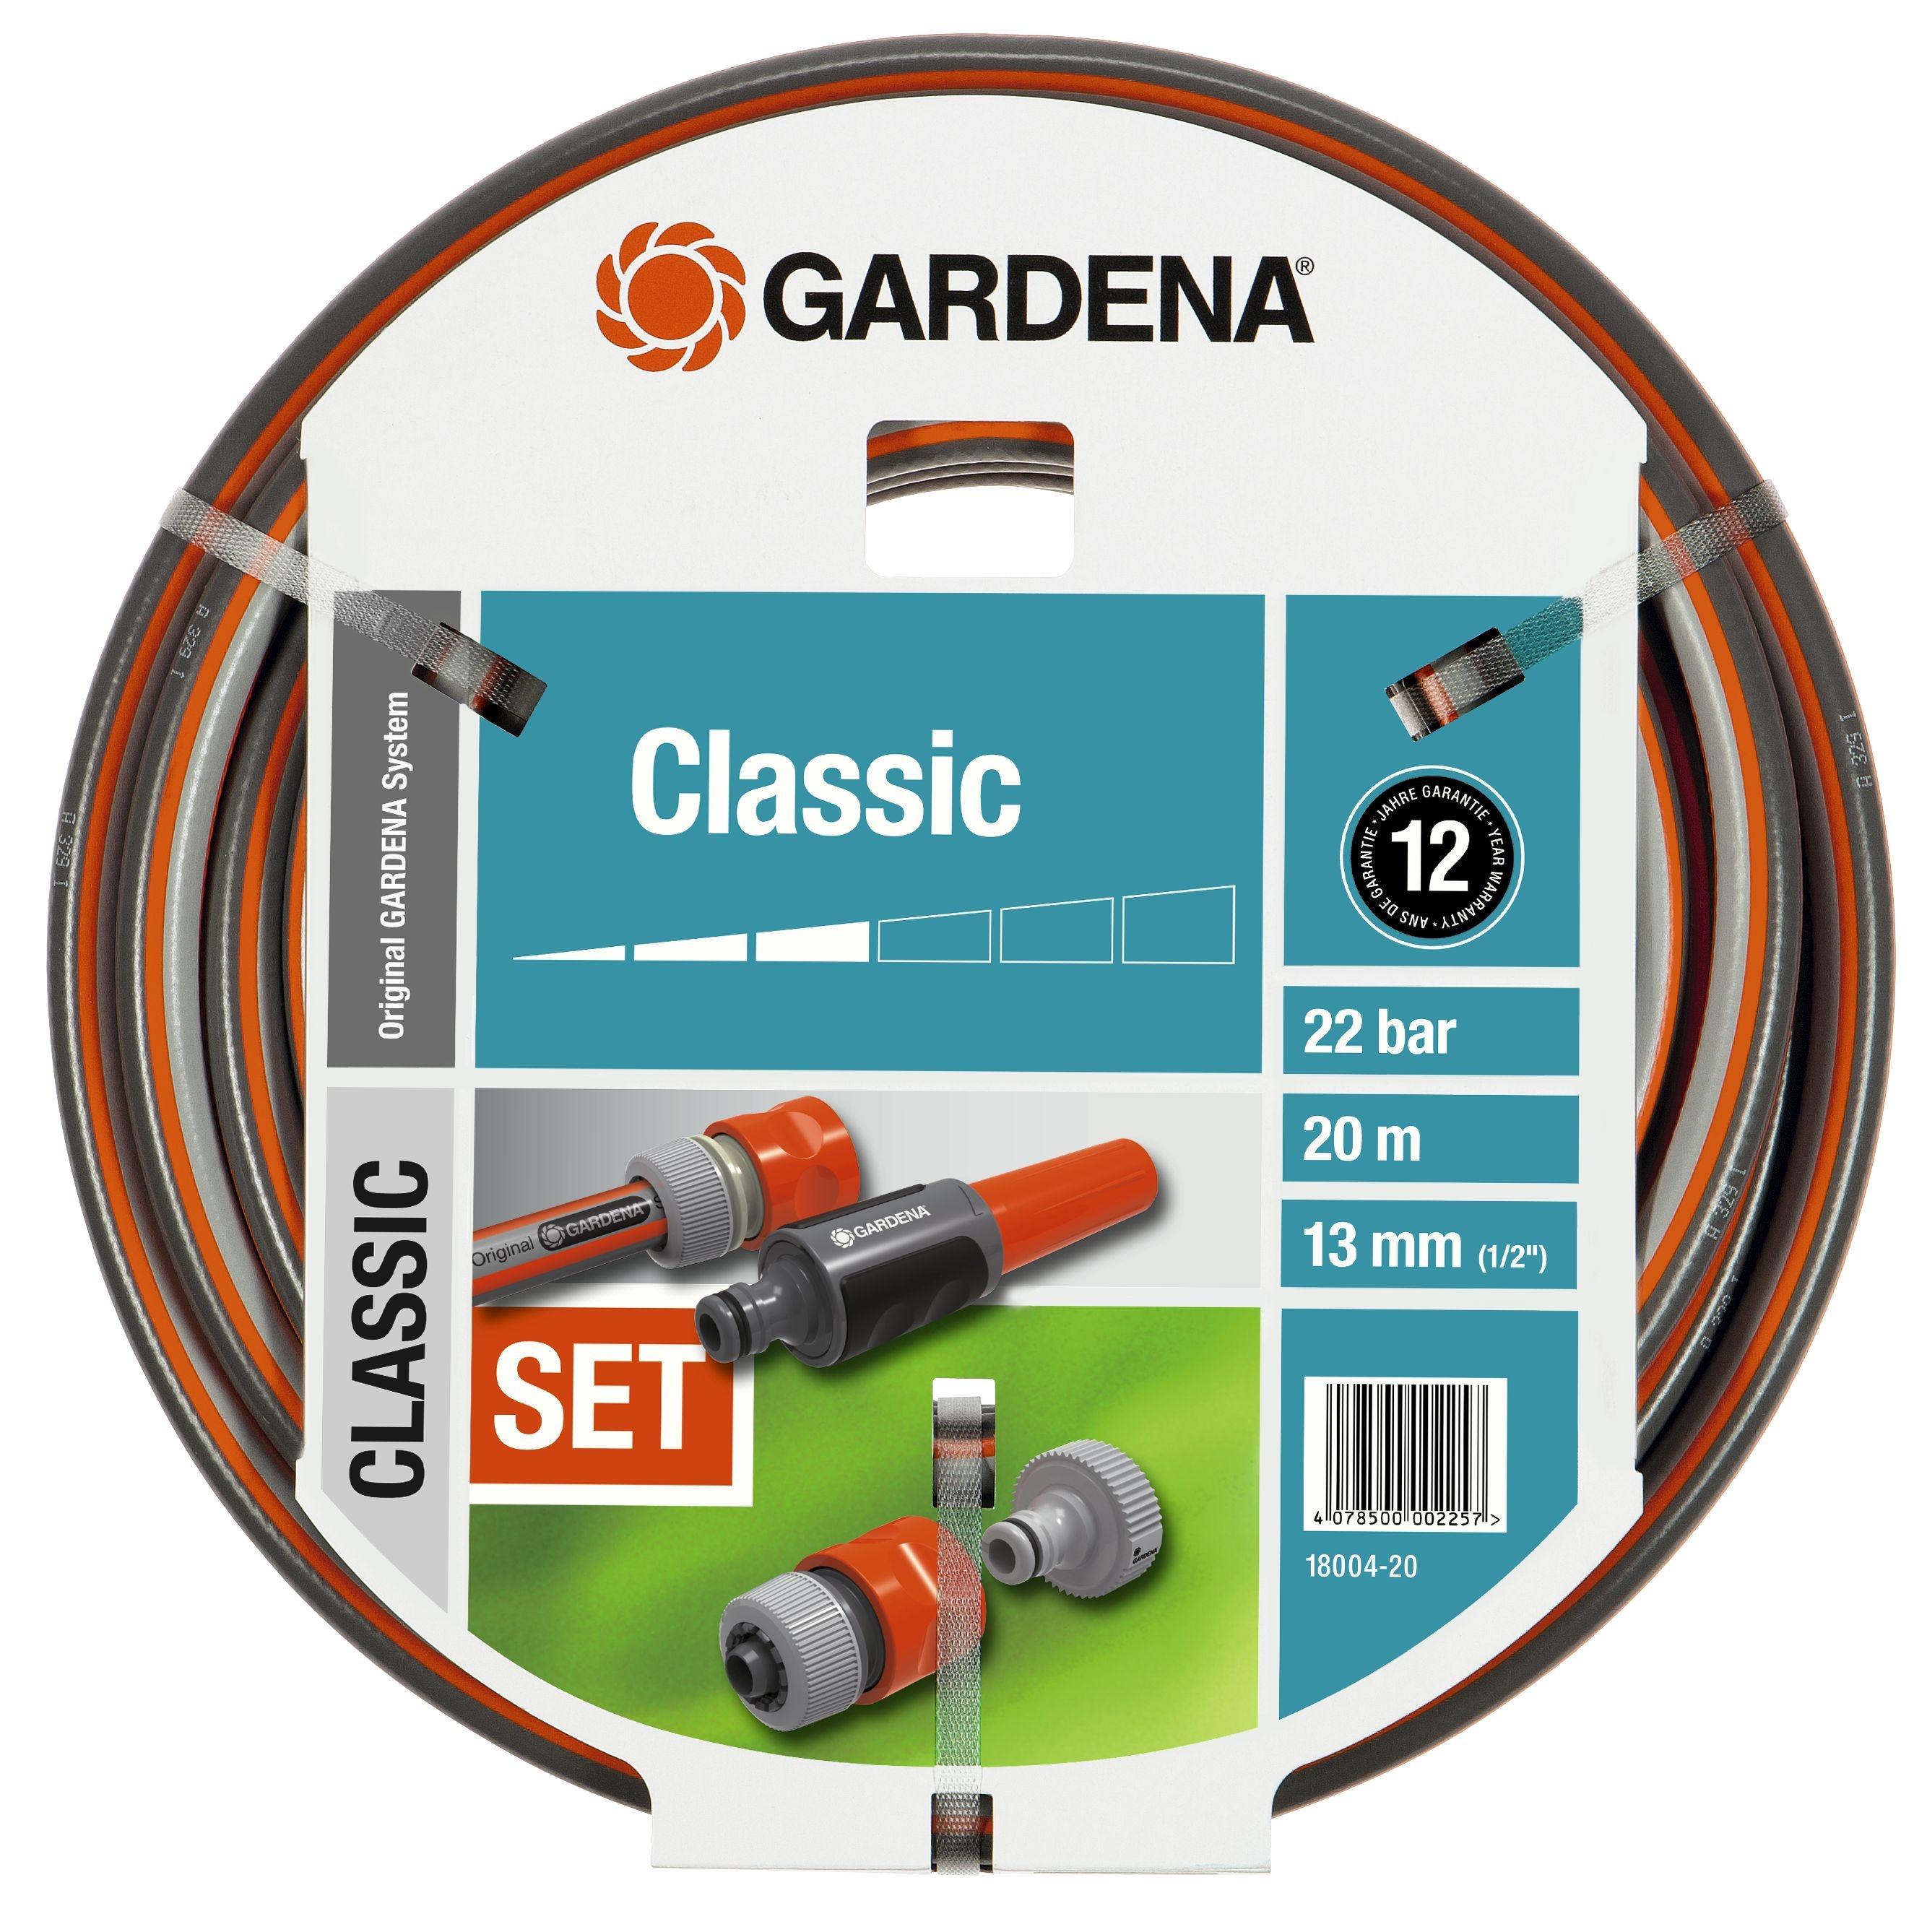 Gardena Tuinslang Classic Startset Ø 13 mm